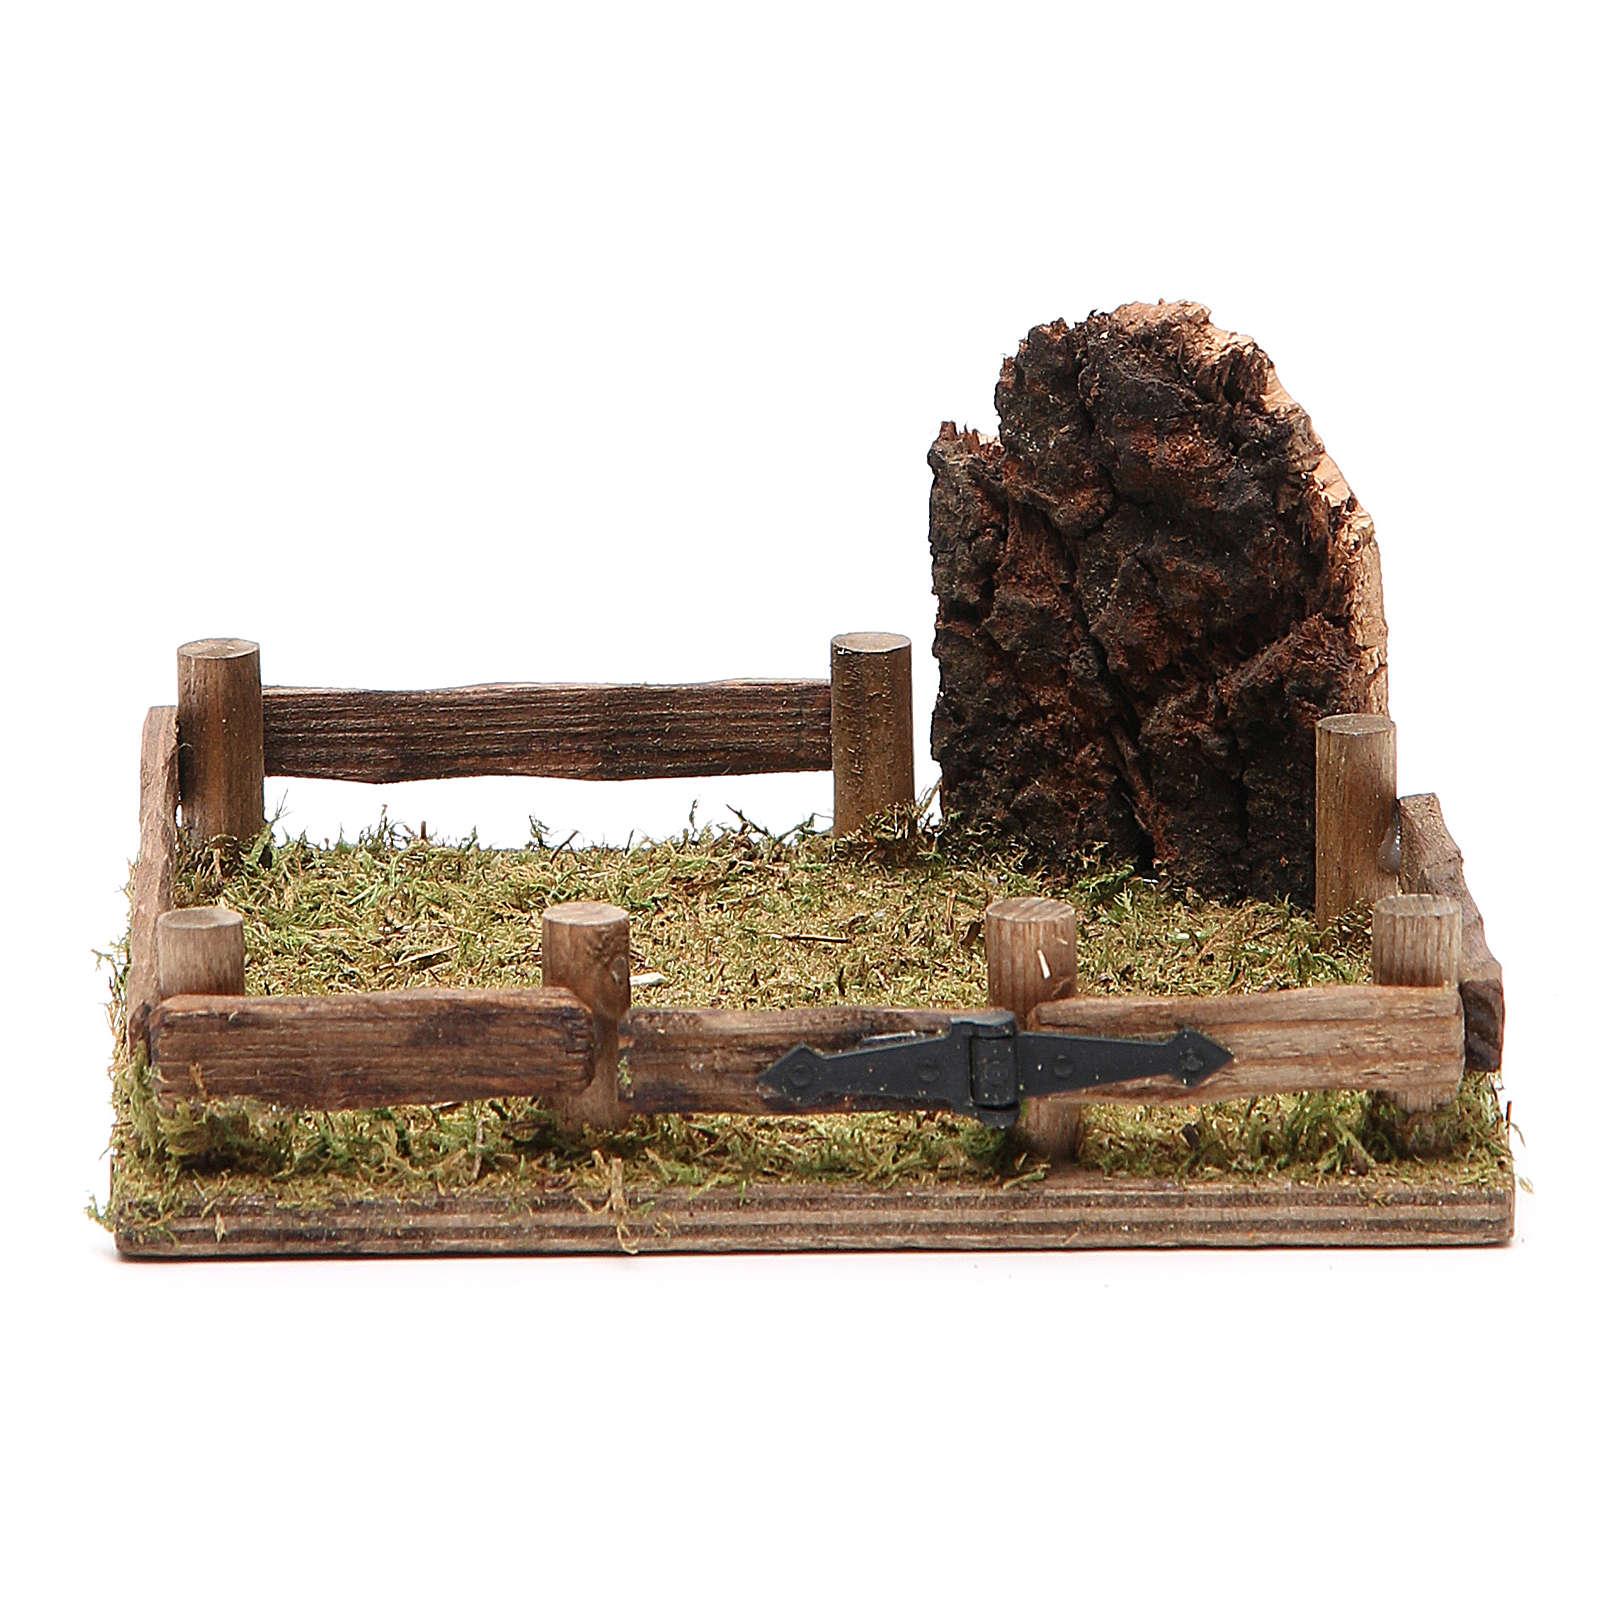 Recinto in legno presepe 12x12 cm 4